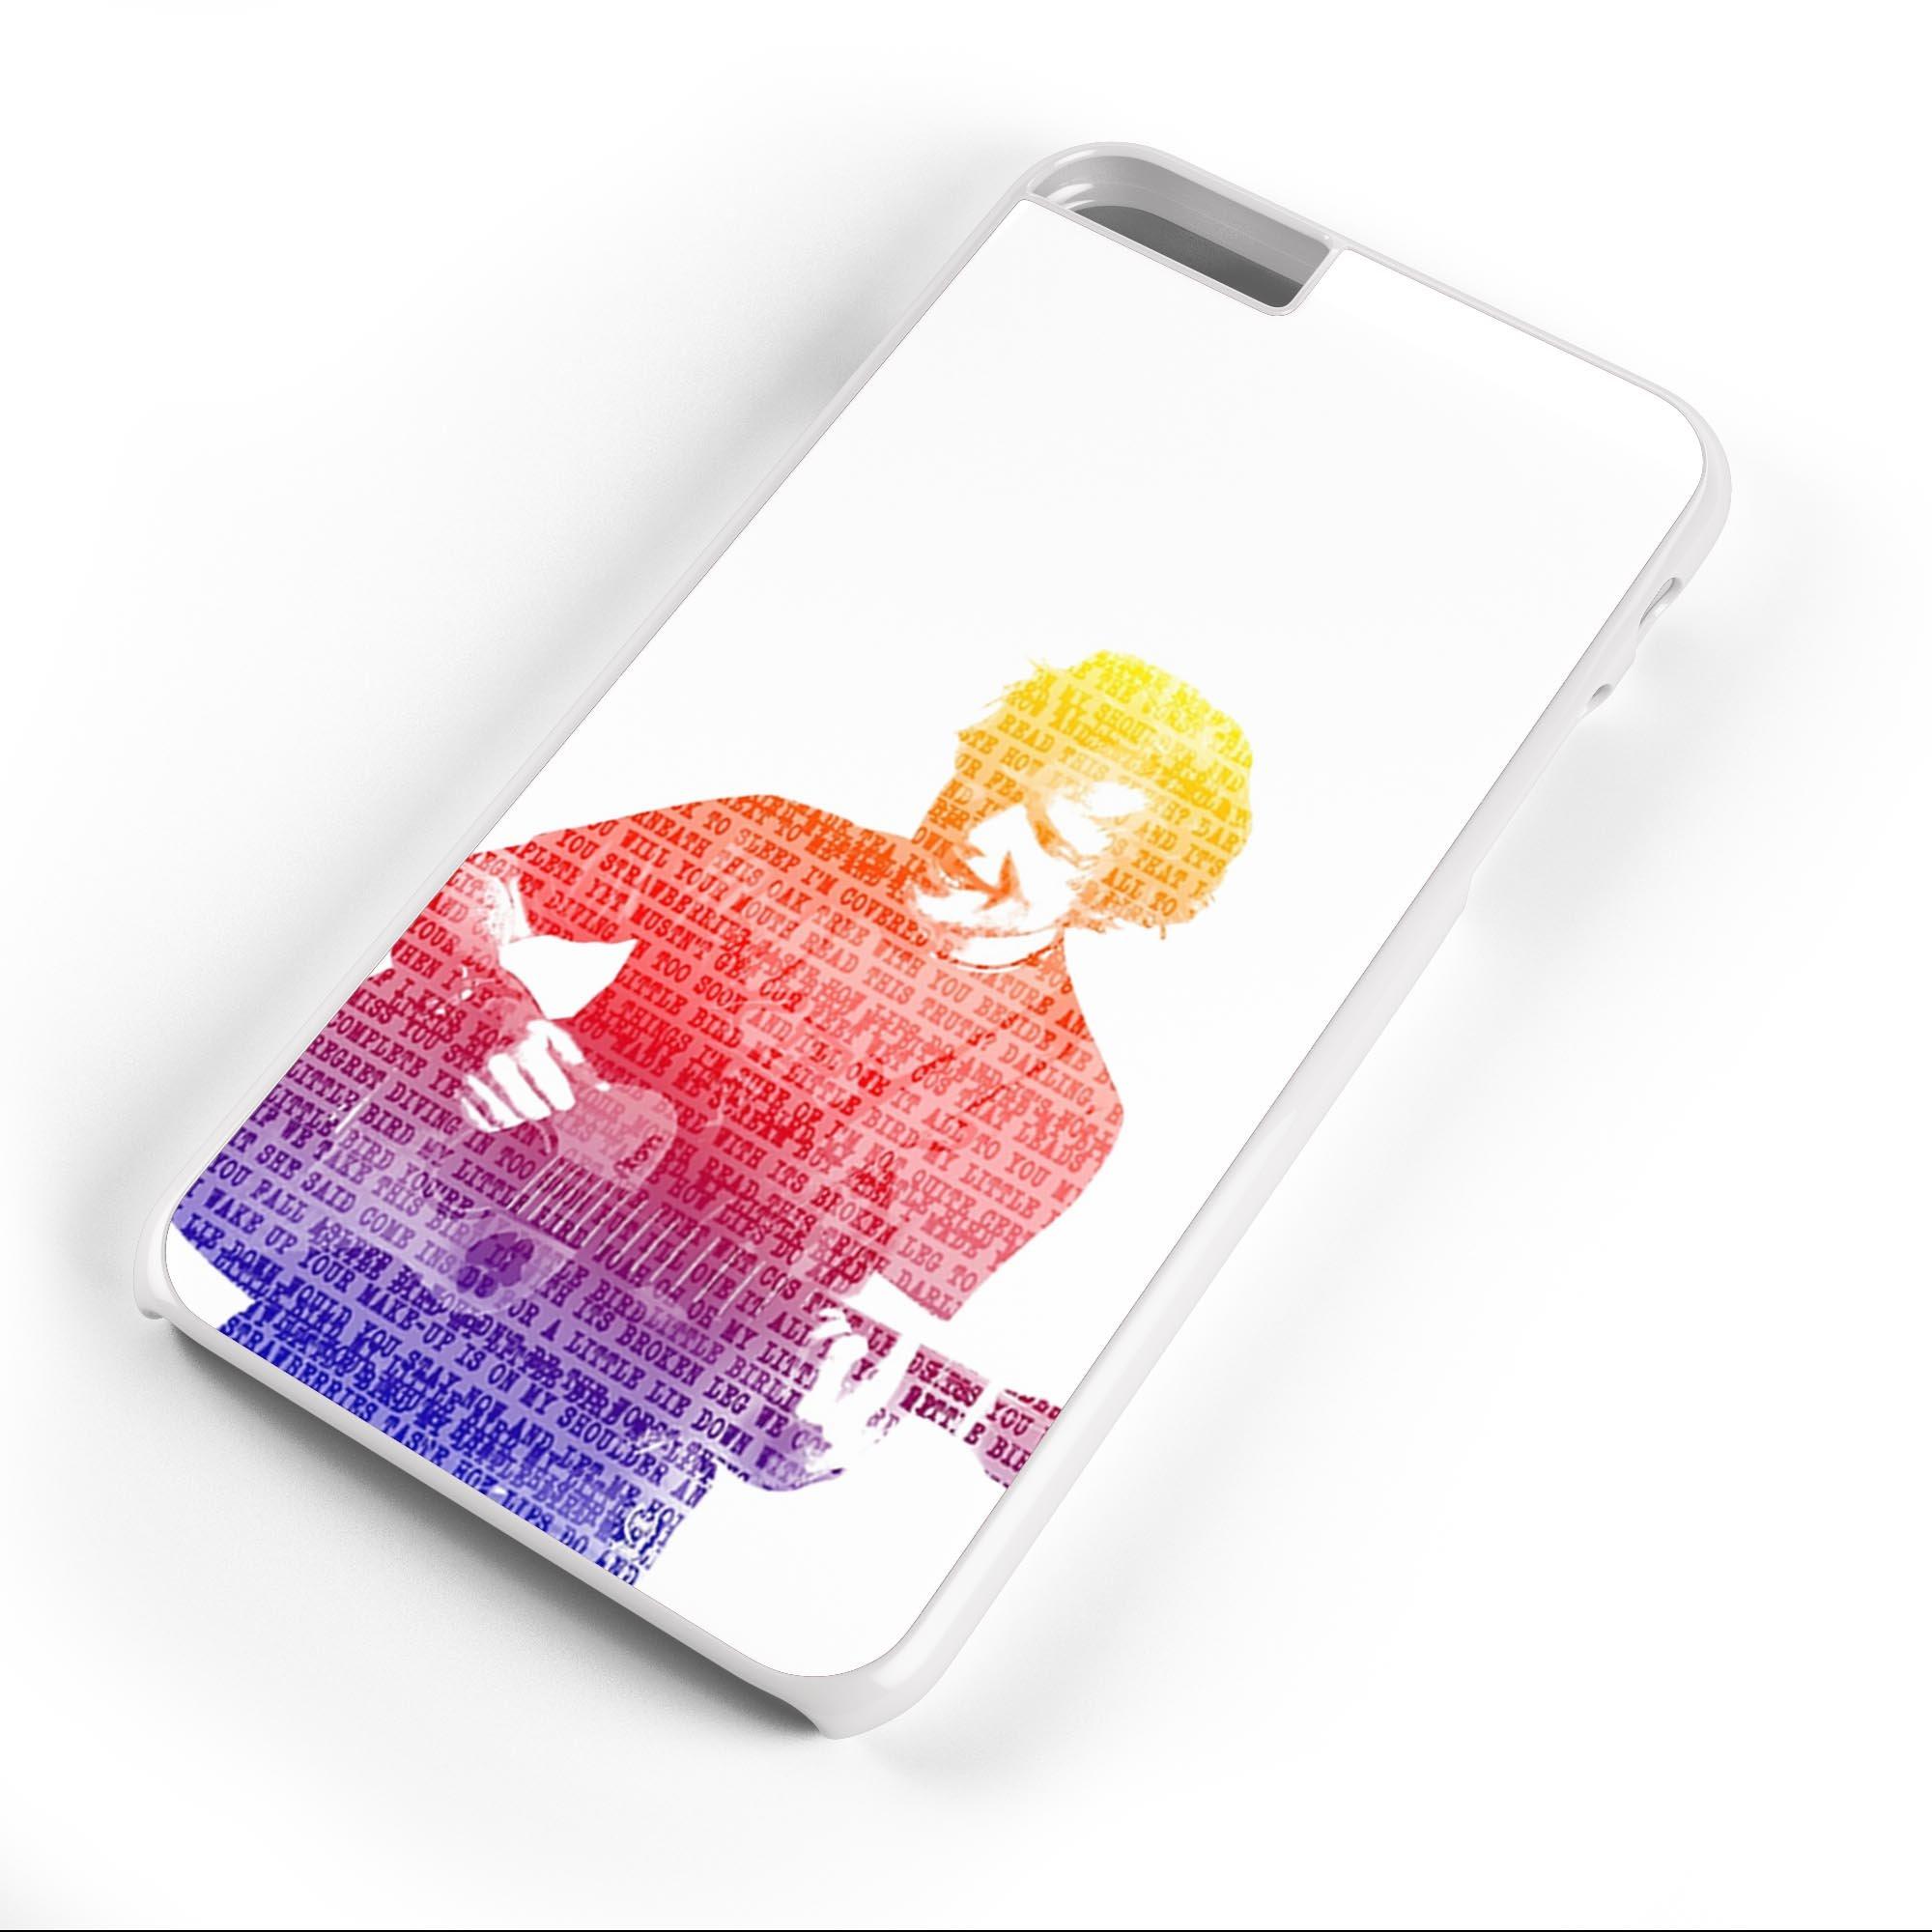 Amazon.com: VC76 - Varisca - Ed Sheeran Little Bird iPhone 6s Case ...